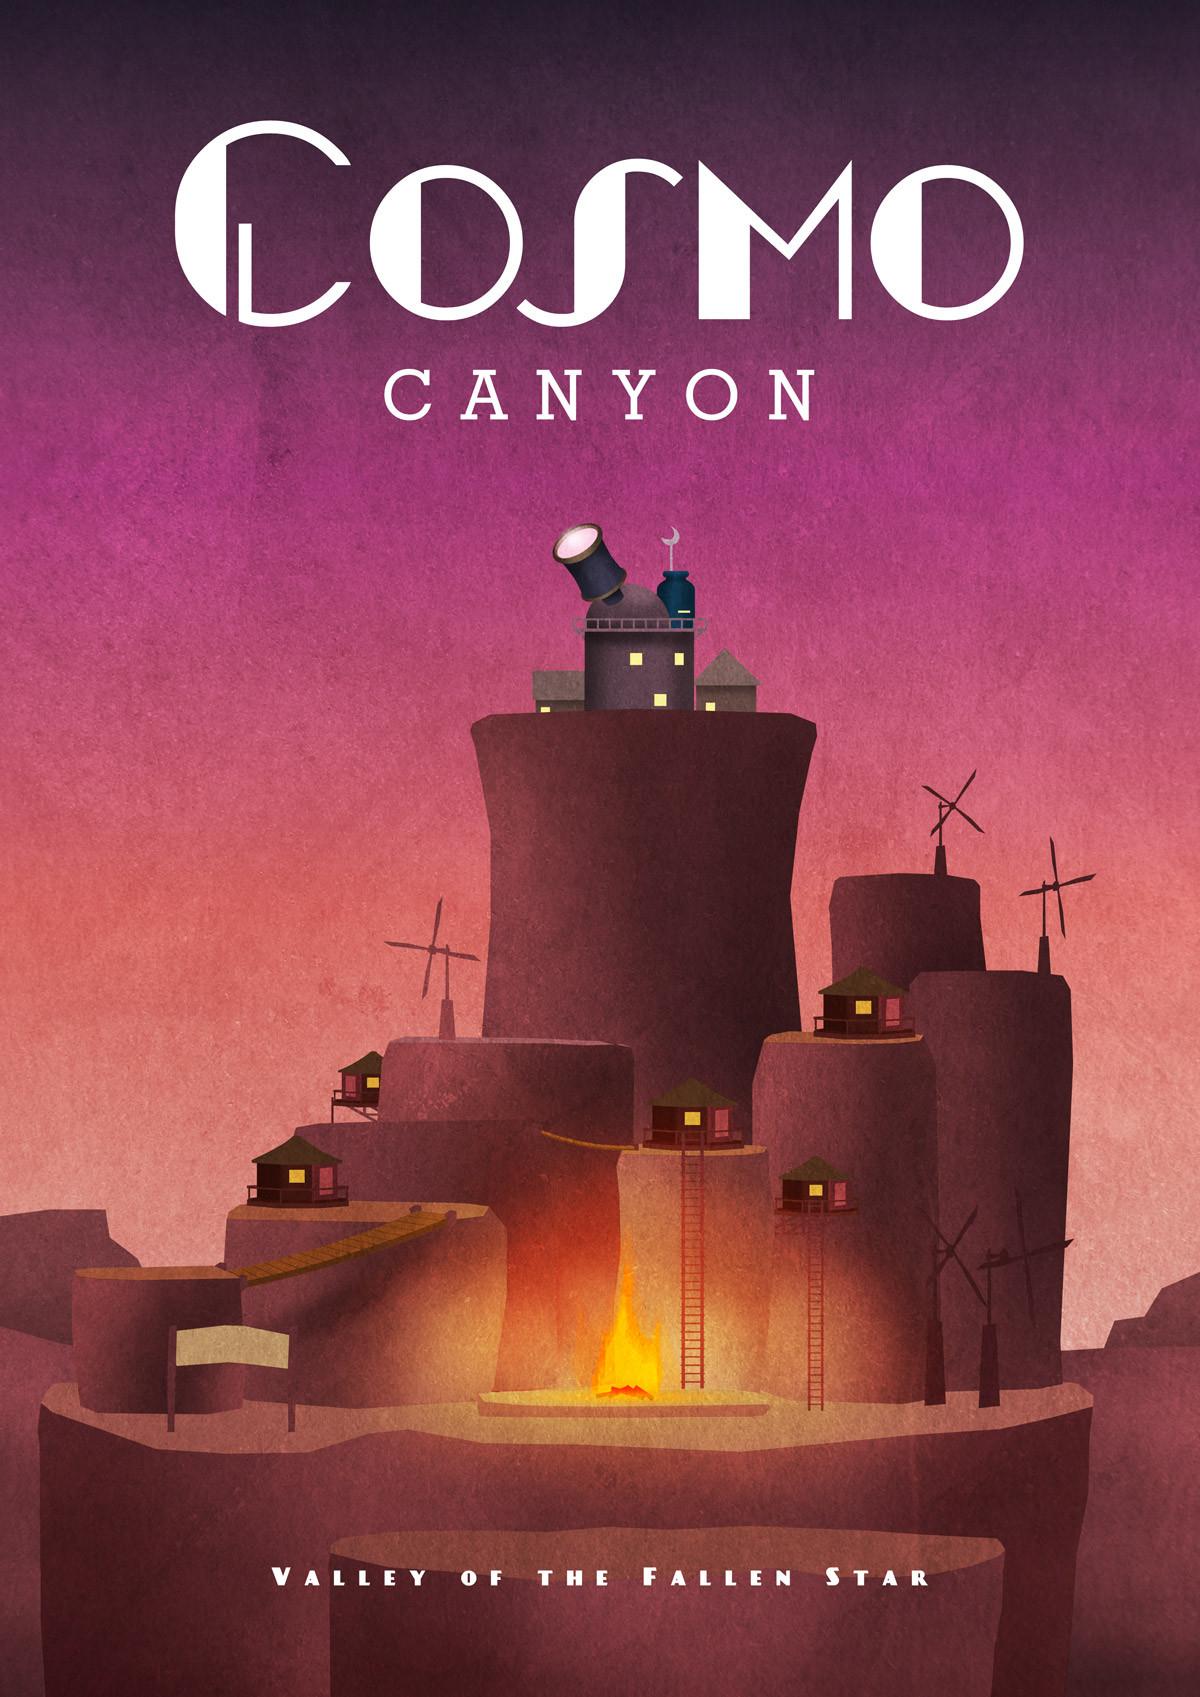 cosmo-canyon-final-fantasy-vii-travel-poster_1